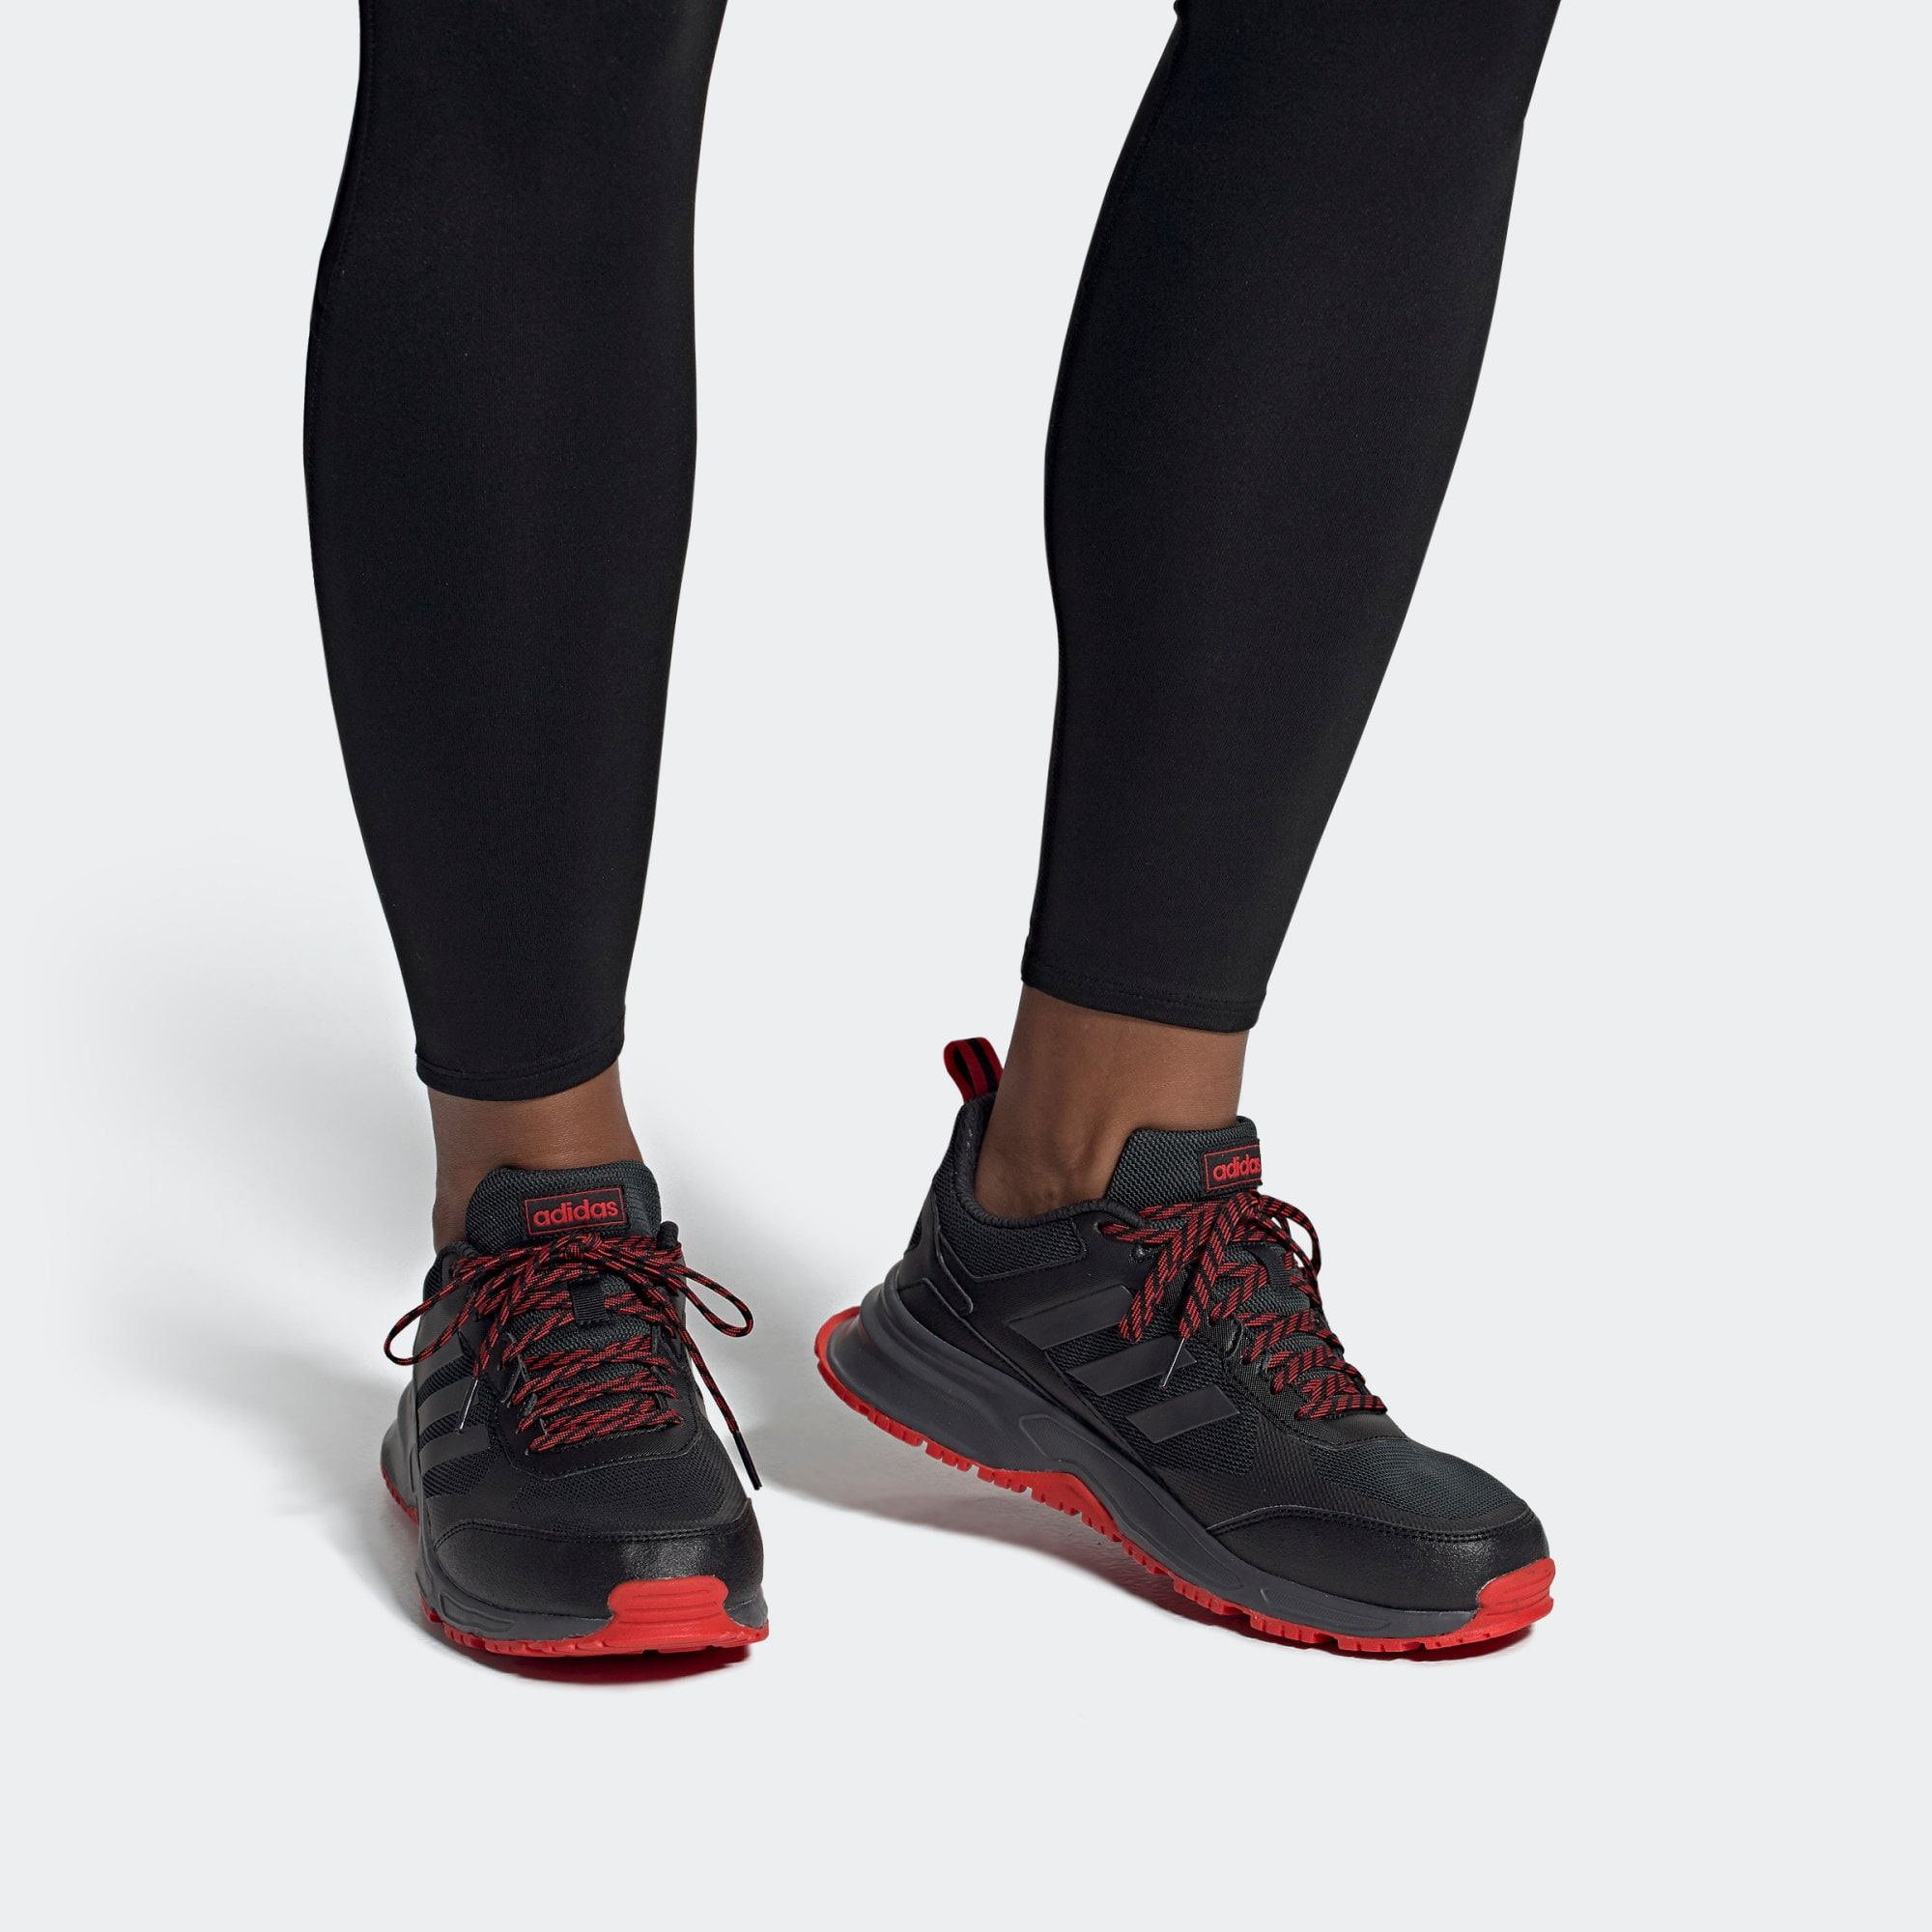 Adidas Performance Laufschuhe Herren Schwarz Rot Grosse 40 5 41 Laufschuhe Adidas Performance Und Schuhe